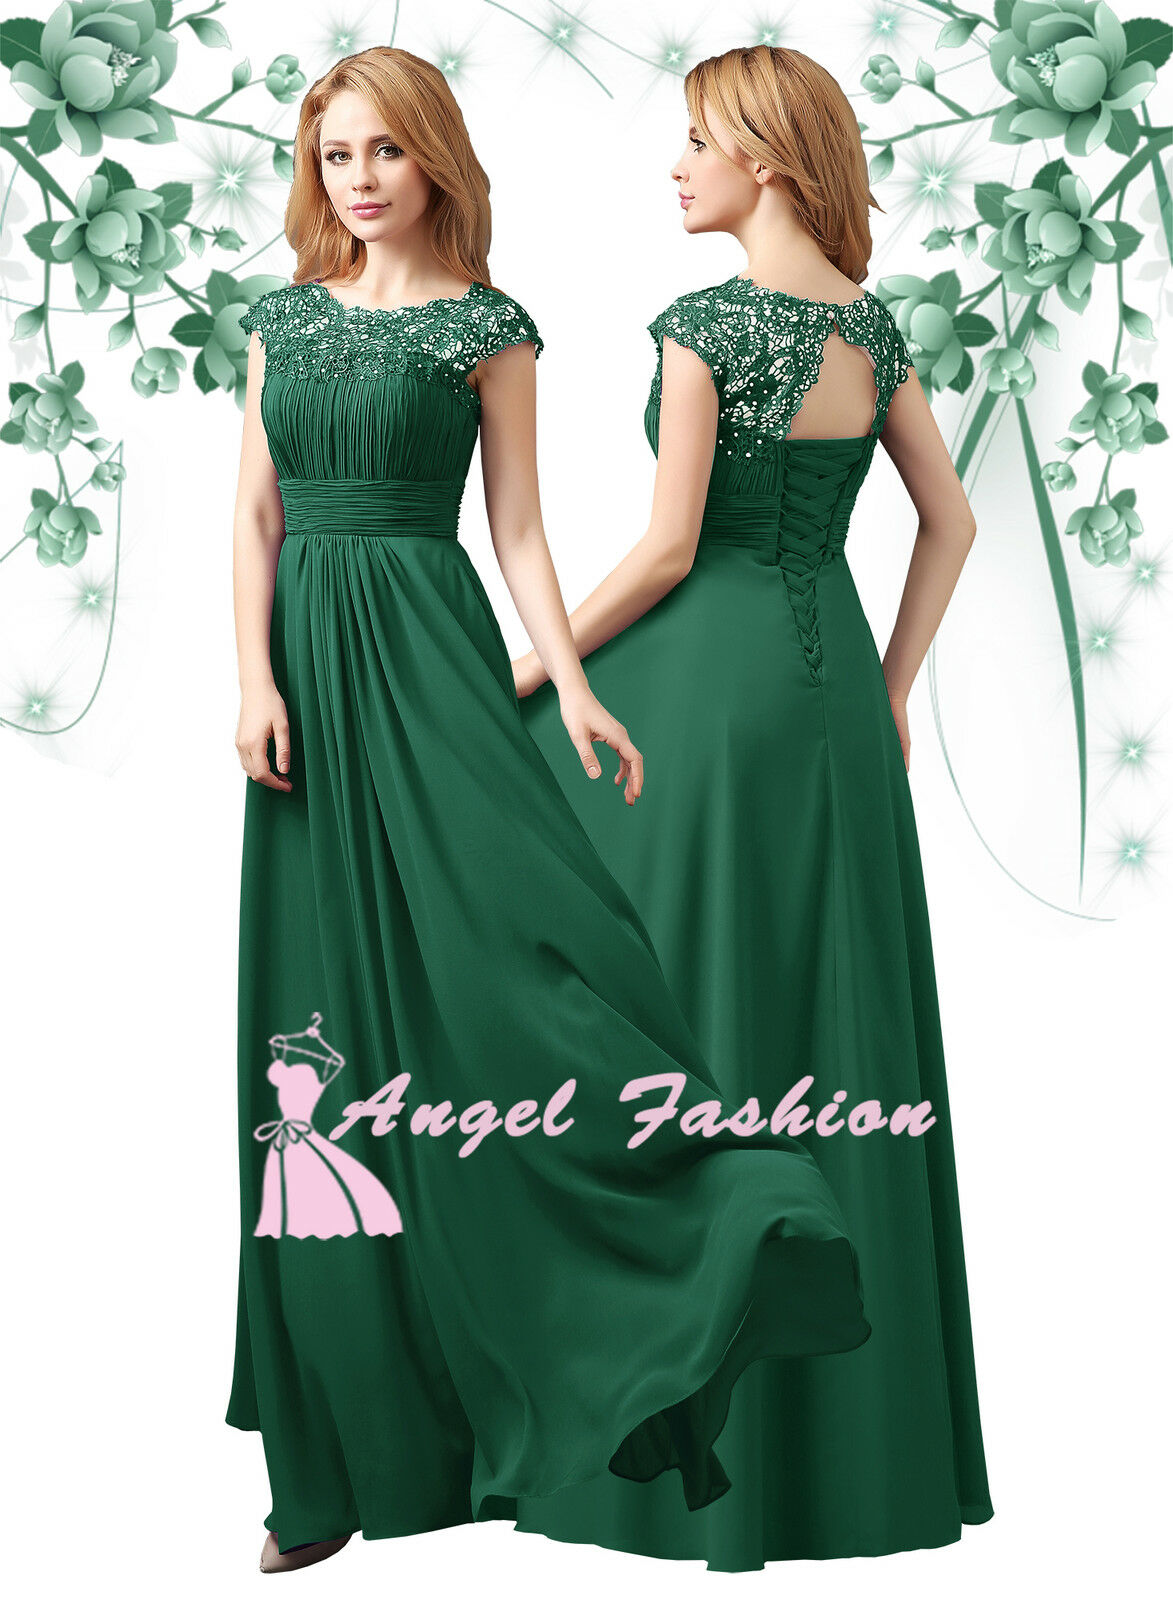 ANGEL M03 Emerald Green Lace Full Length Bridesmaid Prom Evening Dress UK 8 - 24